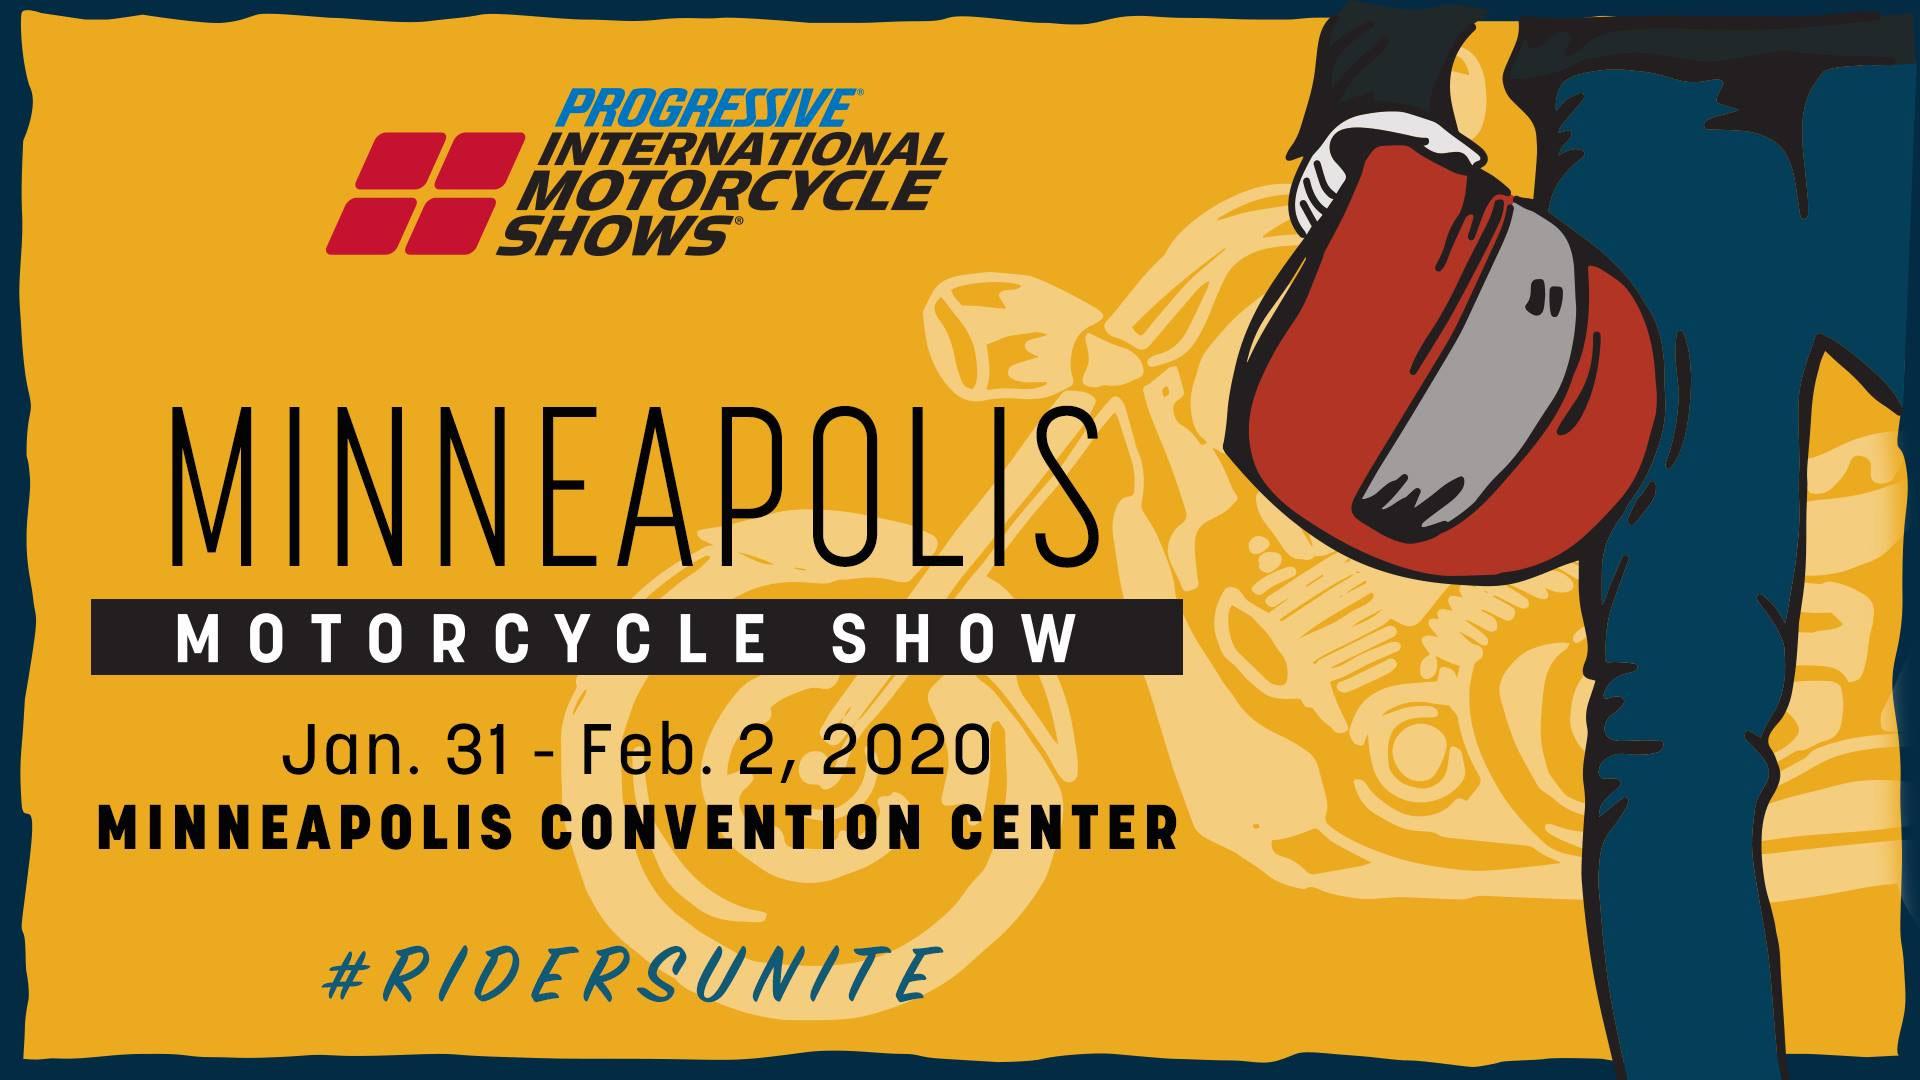 Progressive International Motorcycle Show - Minneapolis Minneapolis,MN